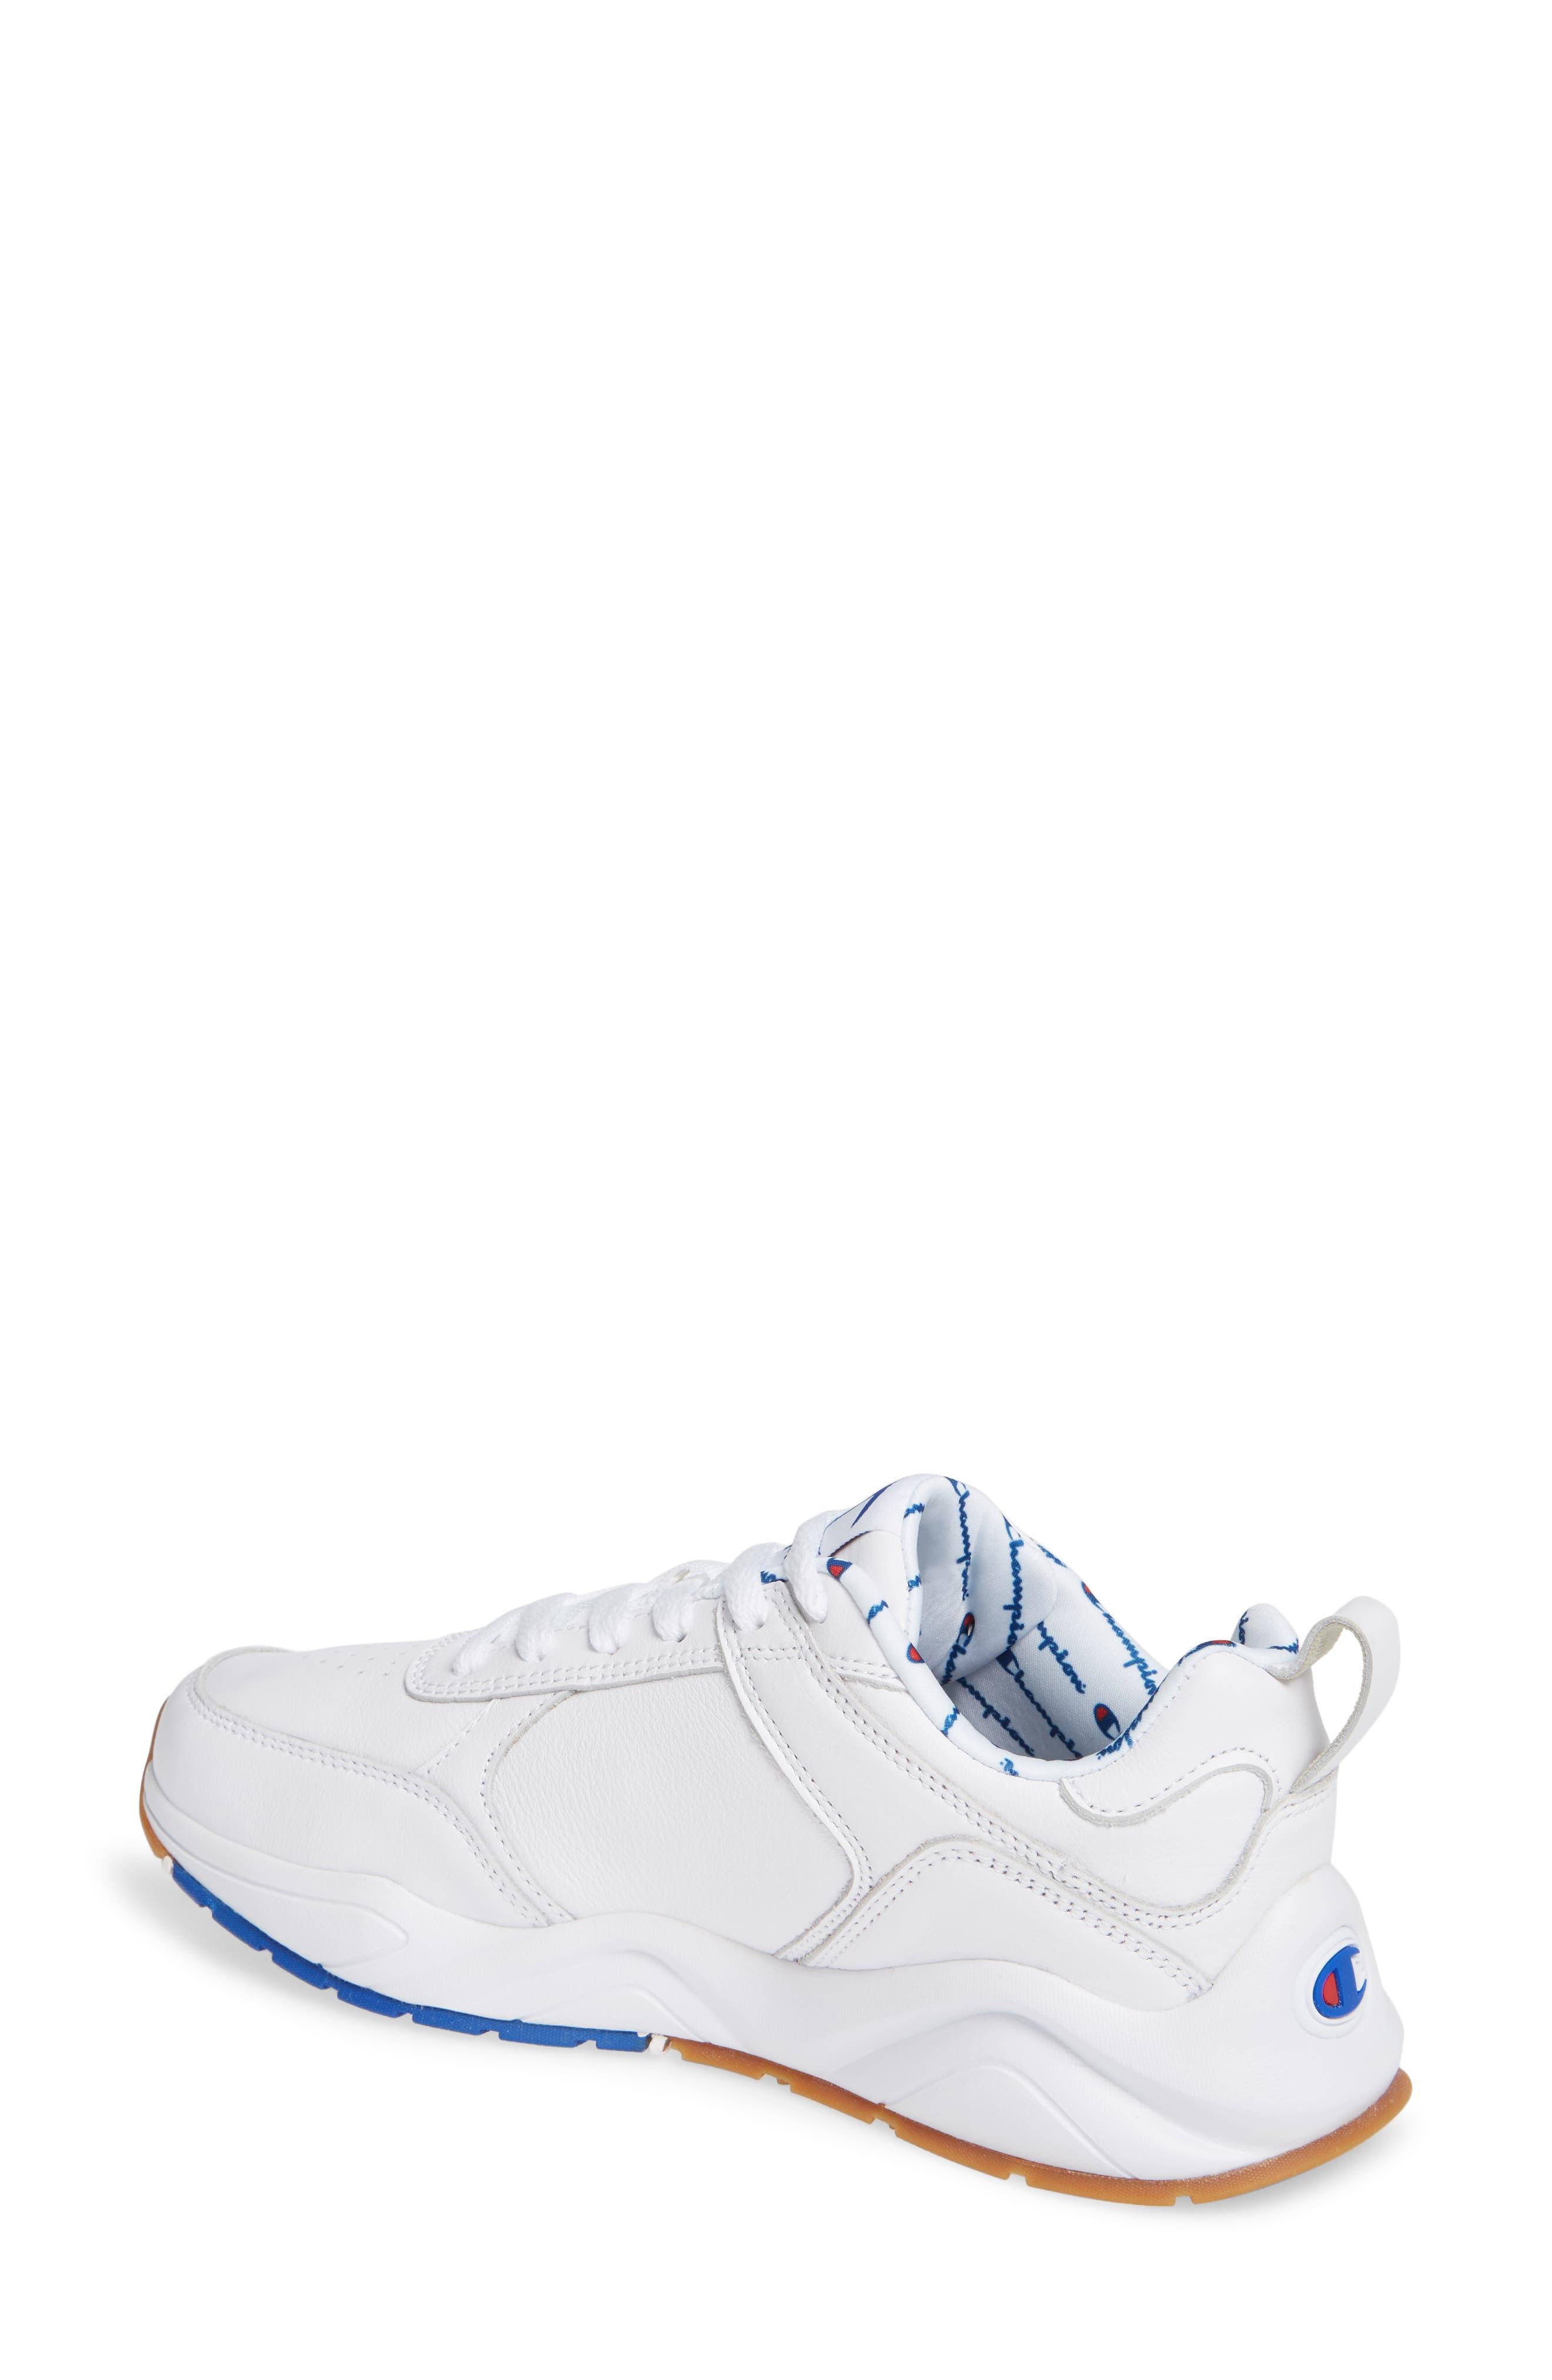 1d2397e2ed07b Women s Champion Sneakers   Running Shoes